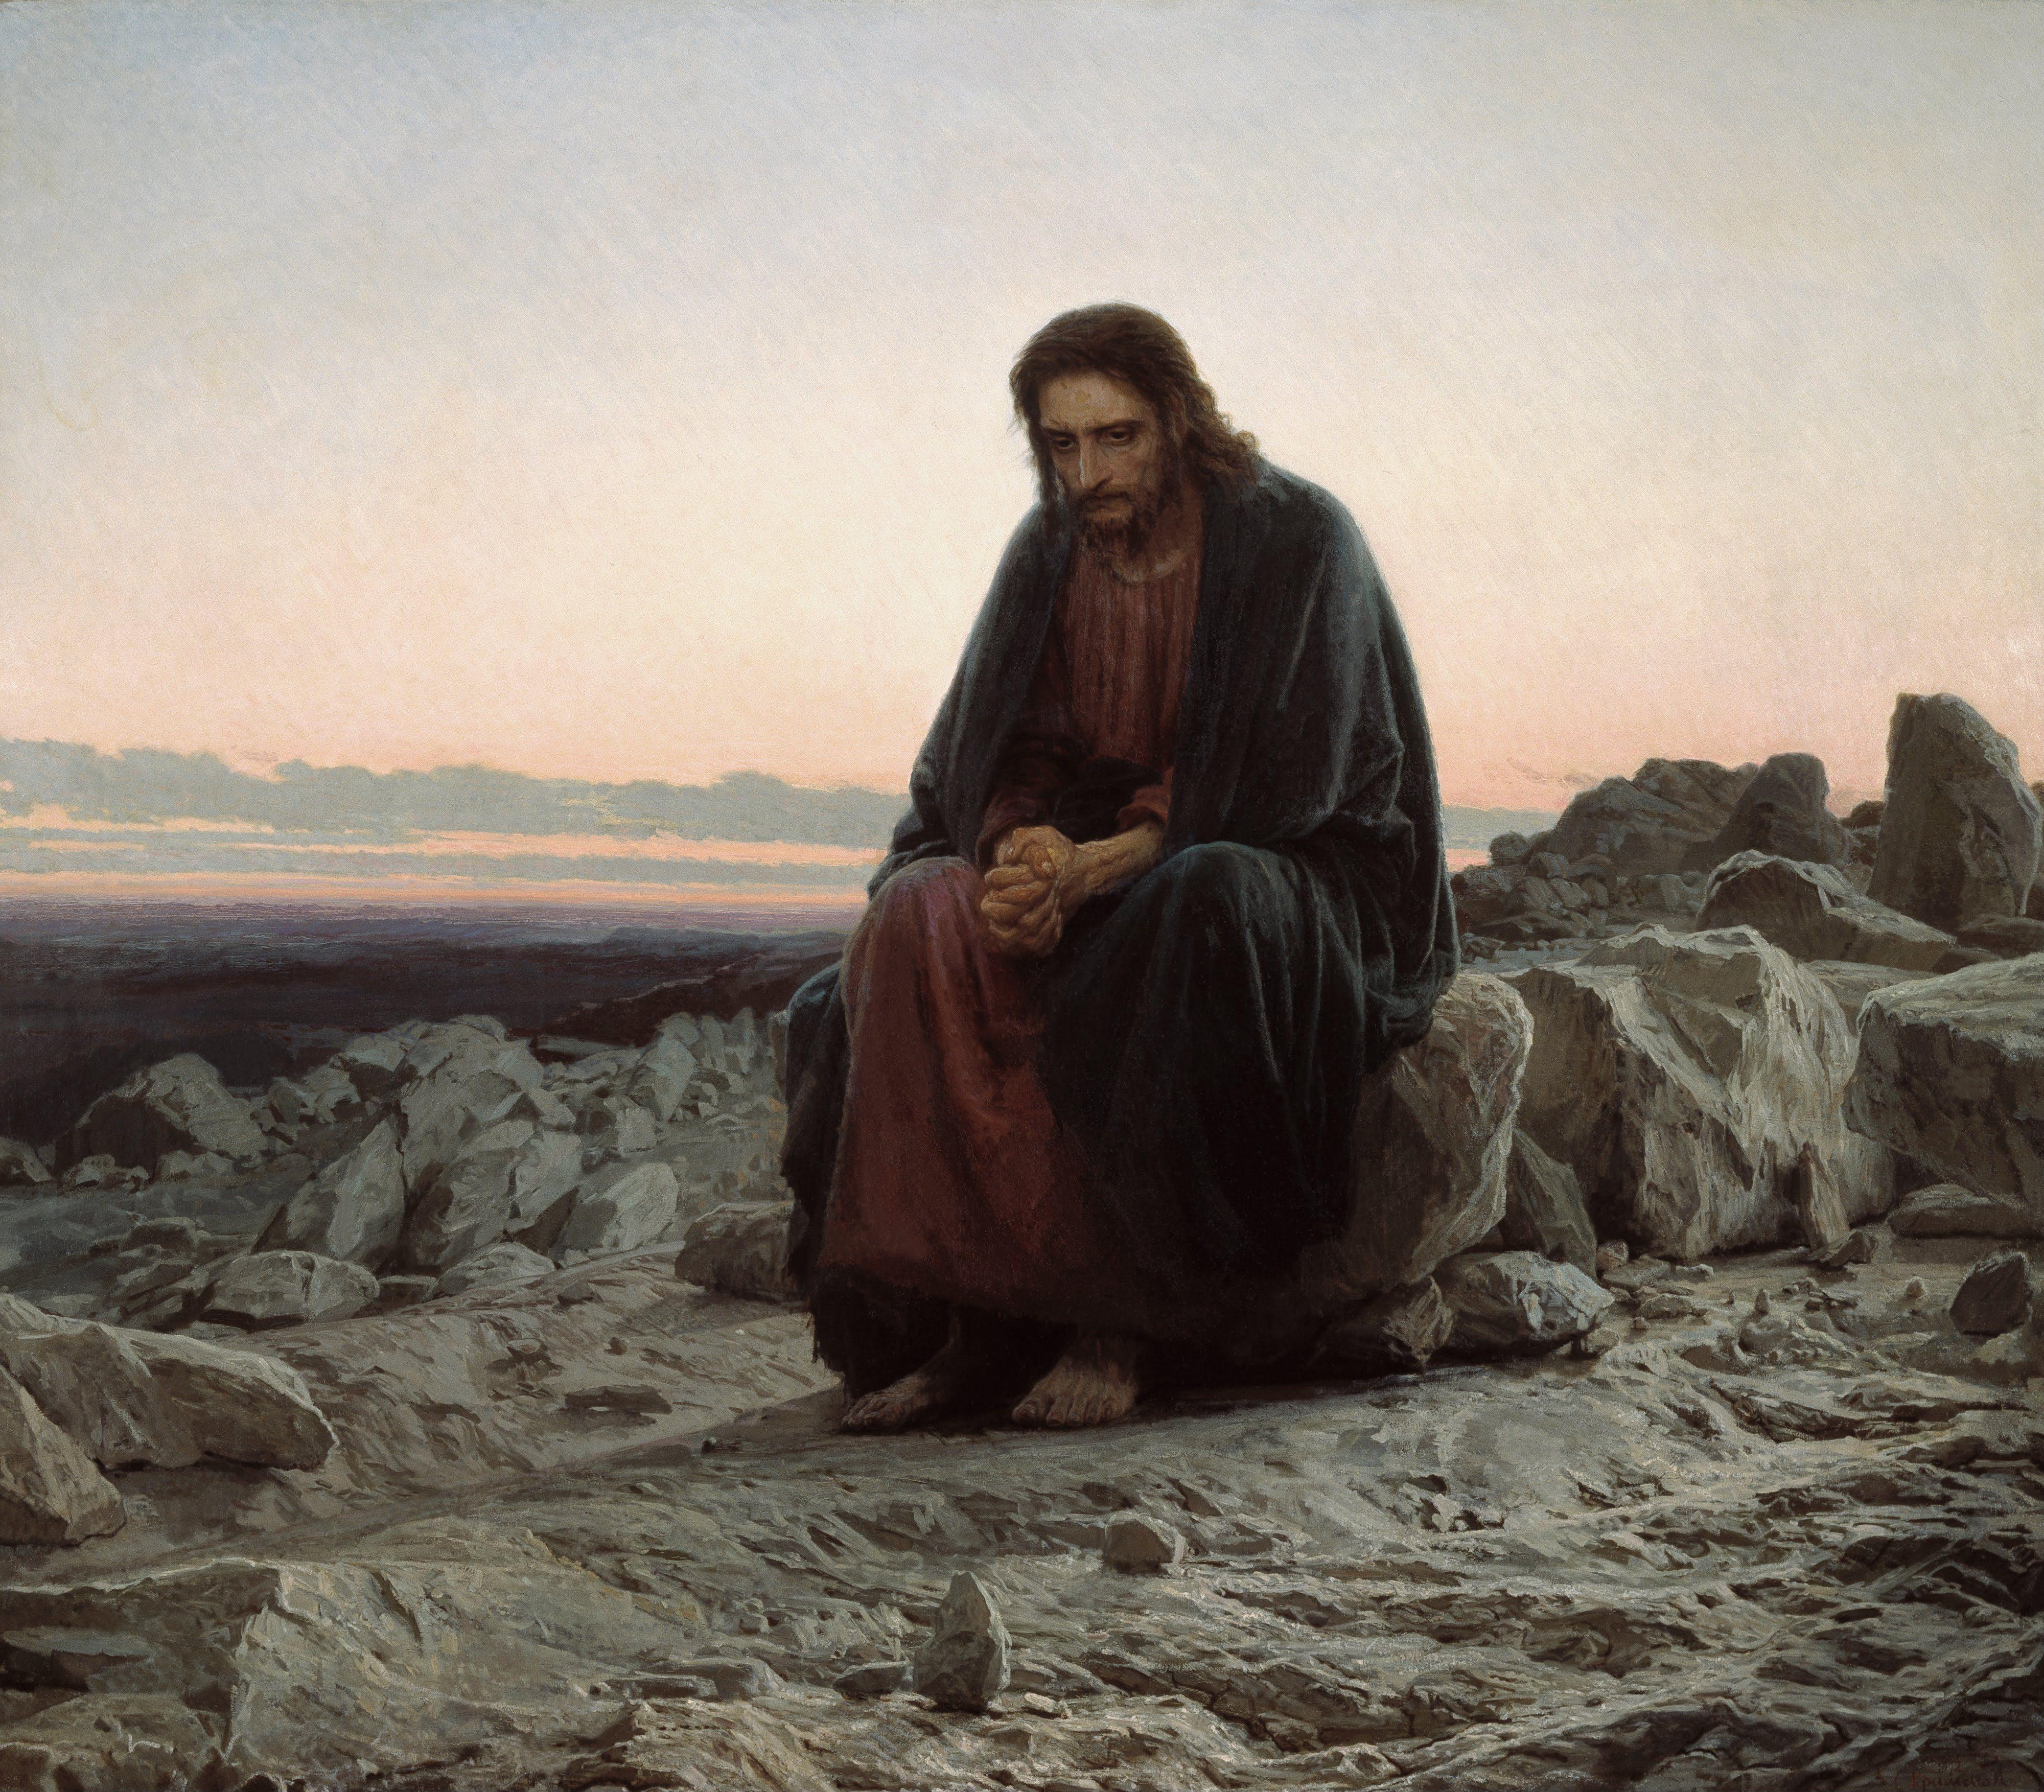 03-christ_in_the_wilderness_-_ivan_kramskoy_-_google_cultural_institute